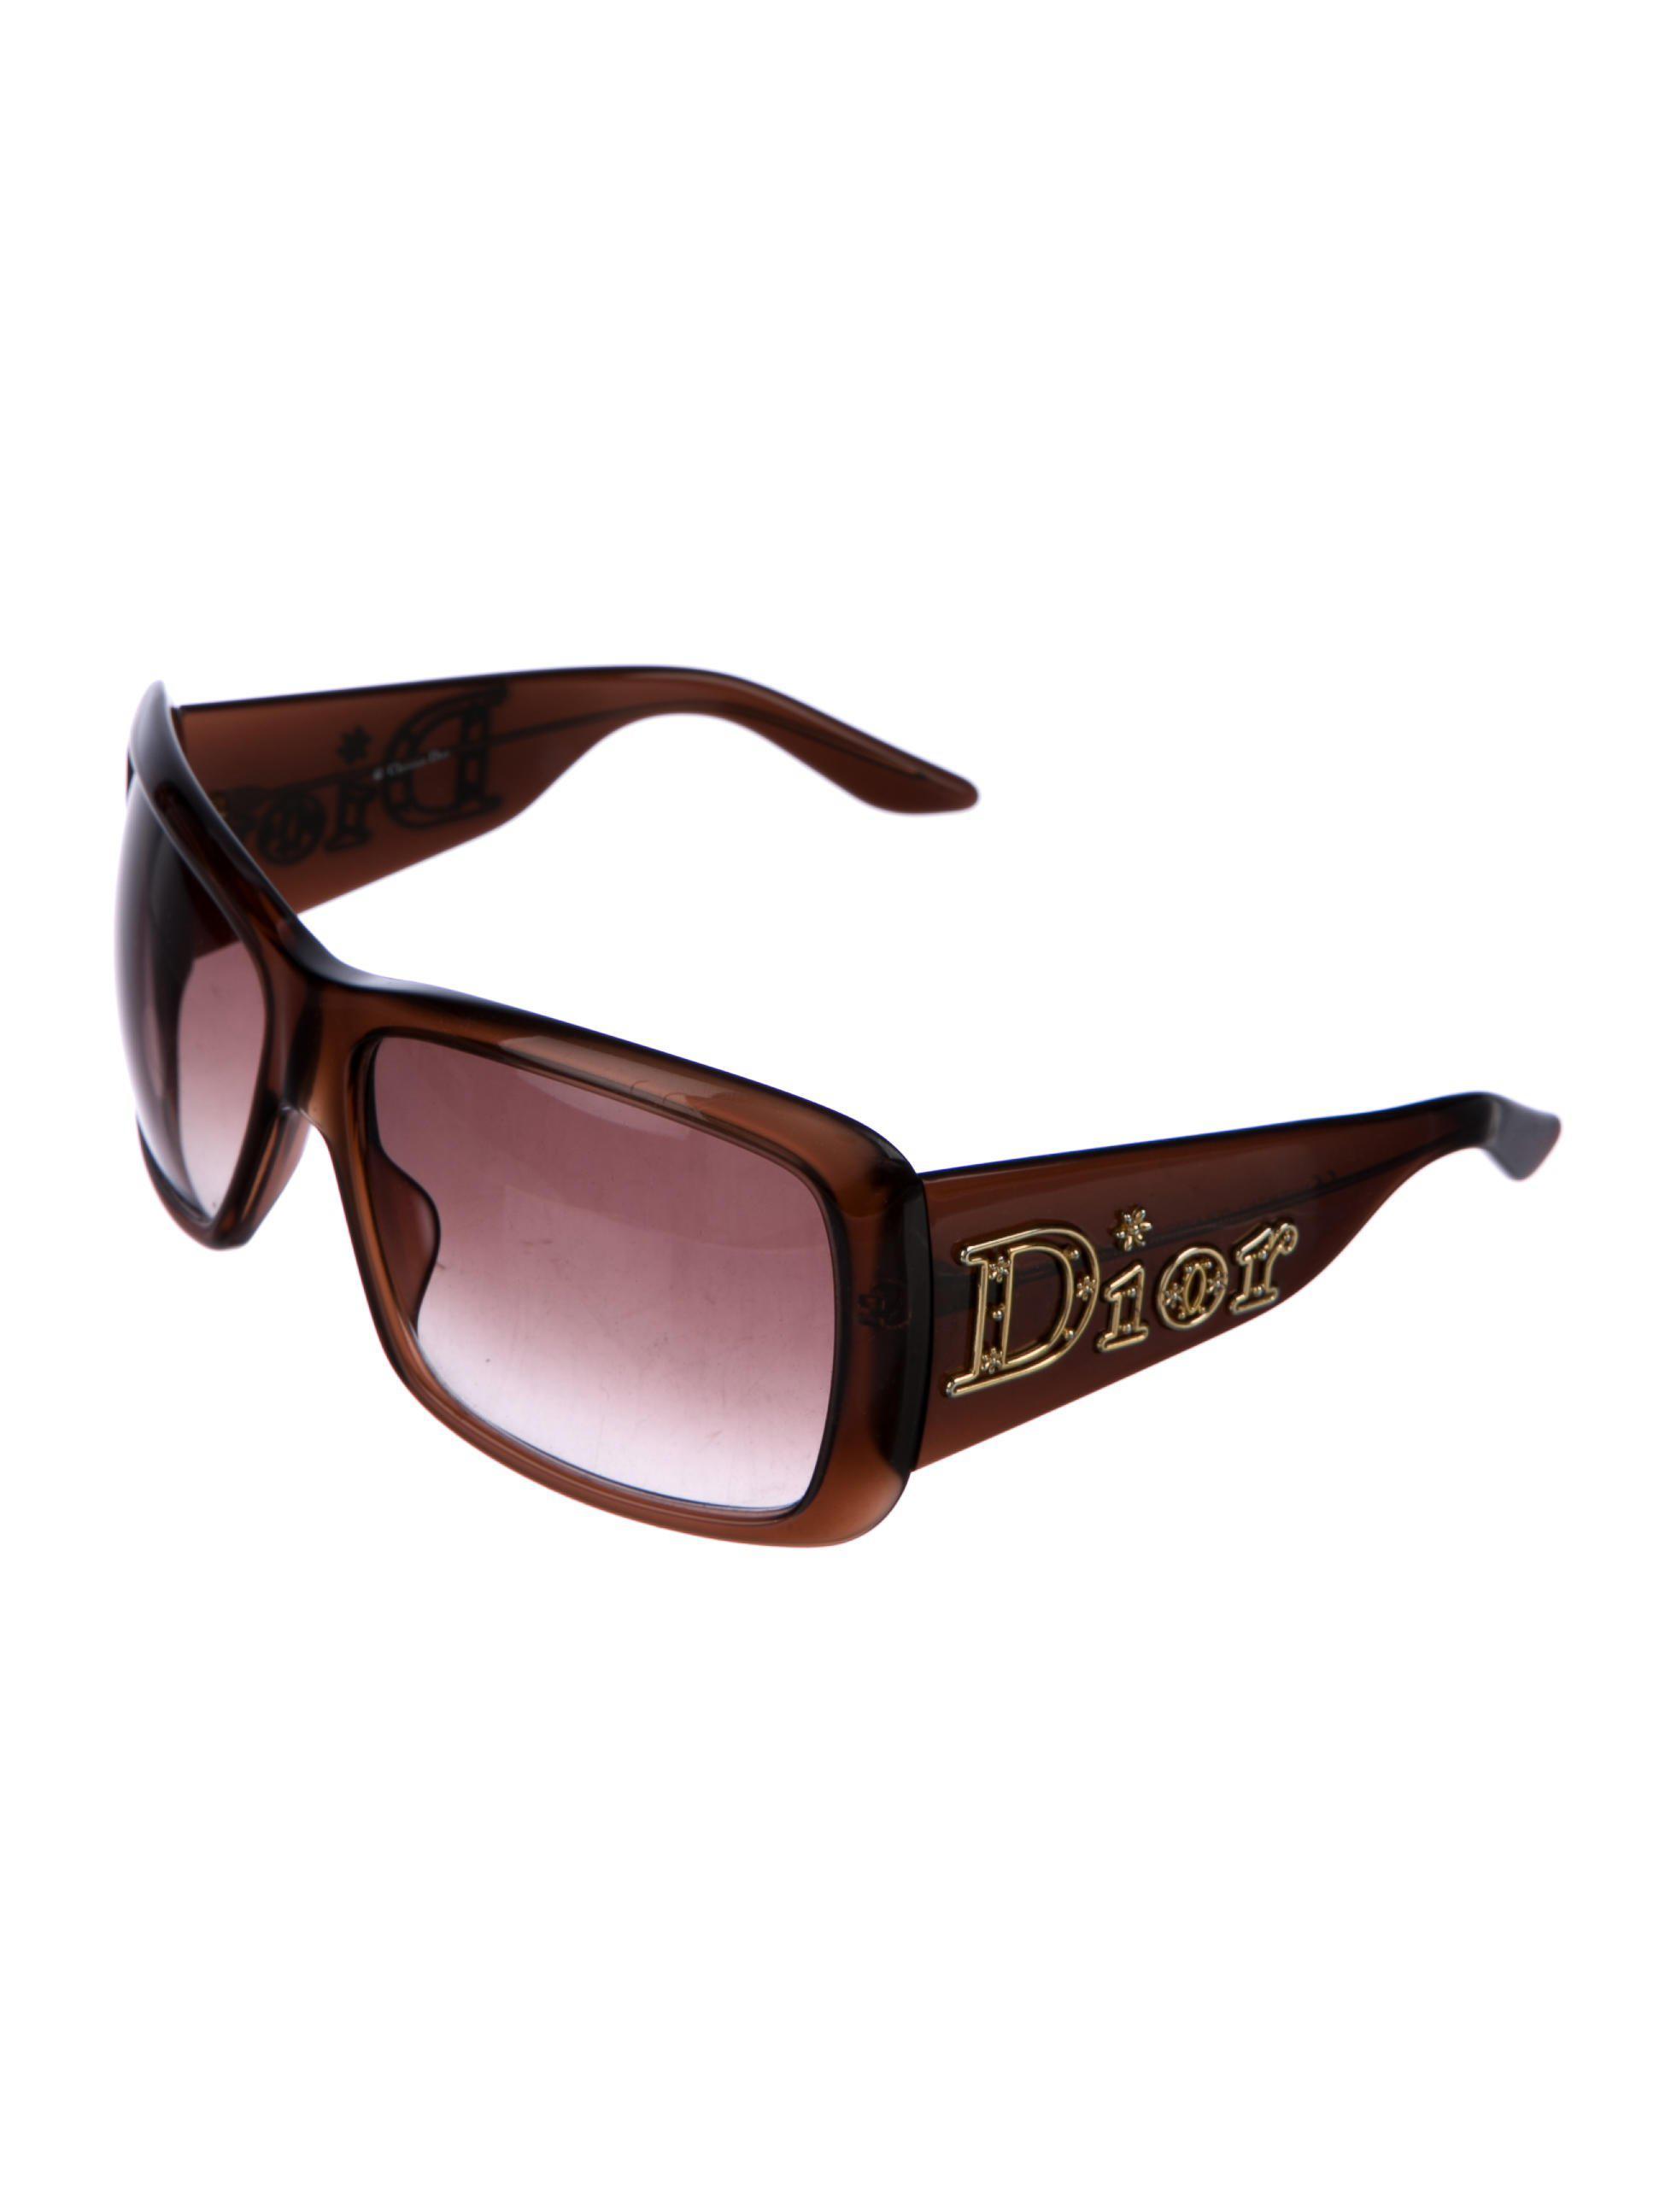 854135f113 Lyst - Dior Homme Christian Aventura Square Sunglasses Brown in Metallic